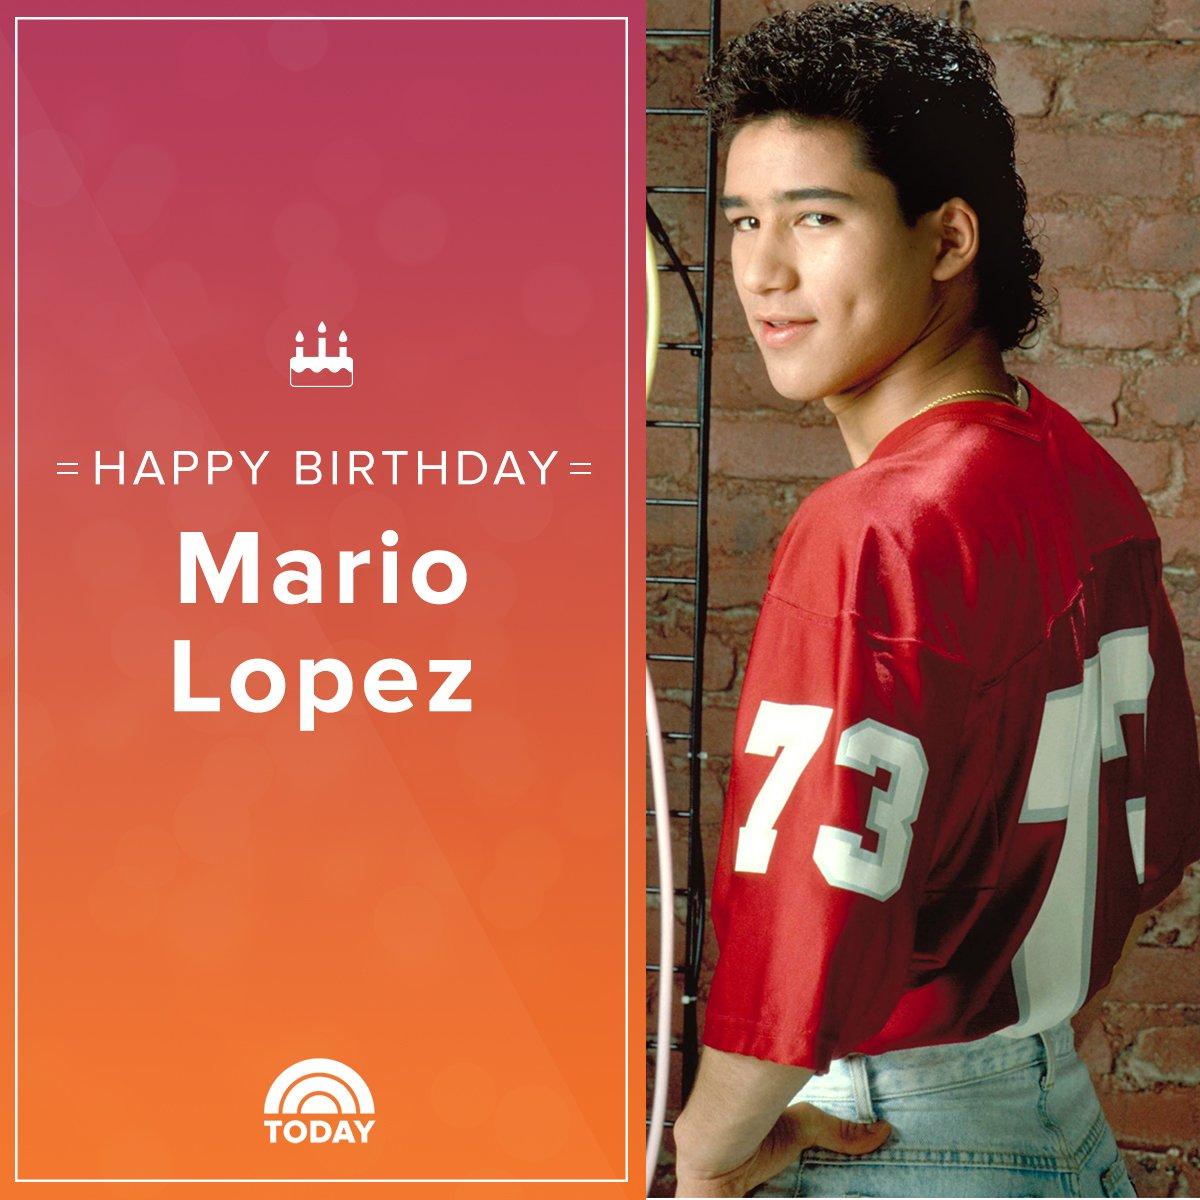 Happy 45th birthday, Mario Lopez!